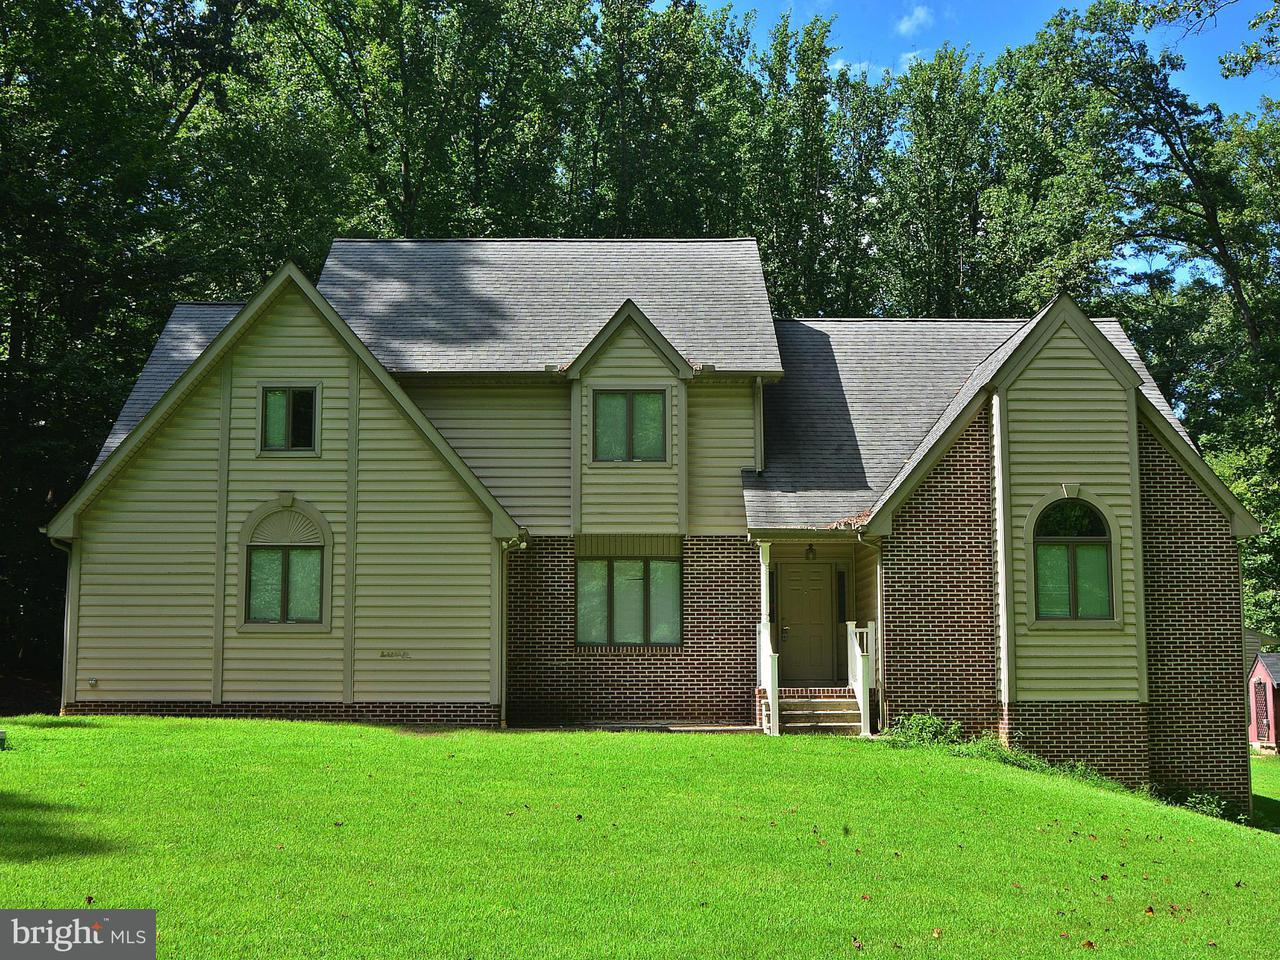 Other Residential for Rent at 3924 Deer Park Ct Havre De Grace, Maryland 21078 United States